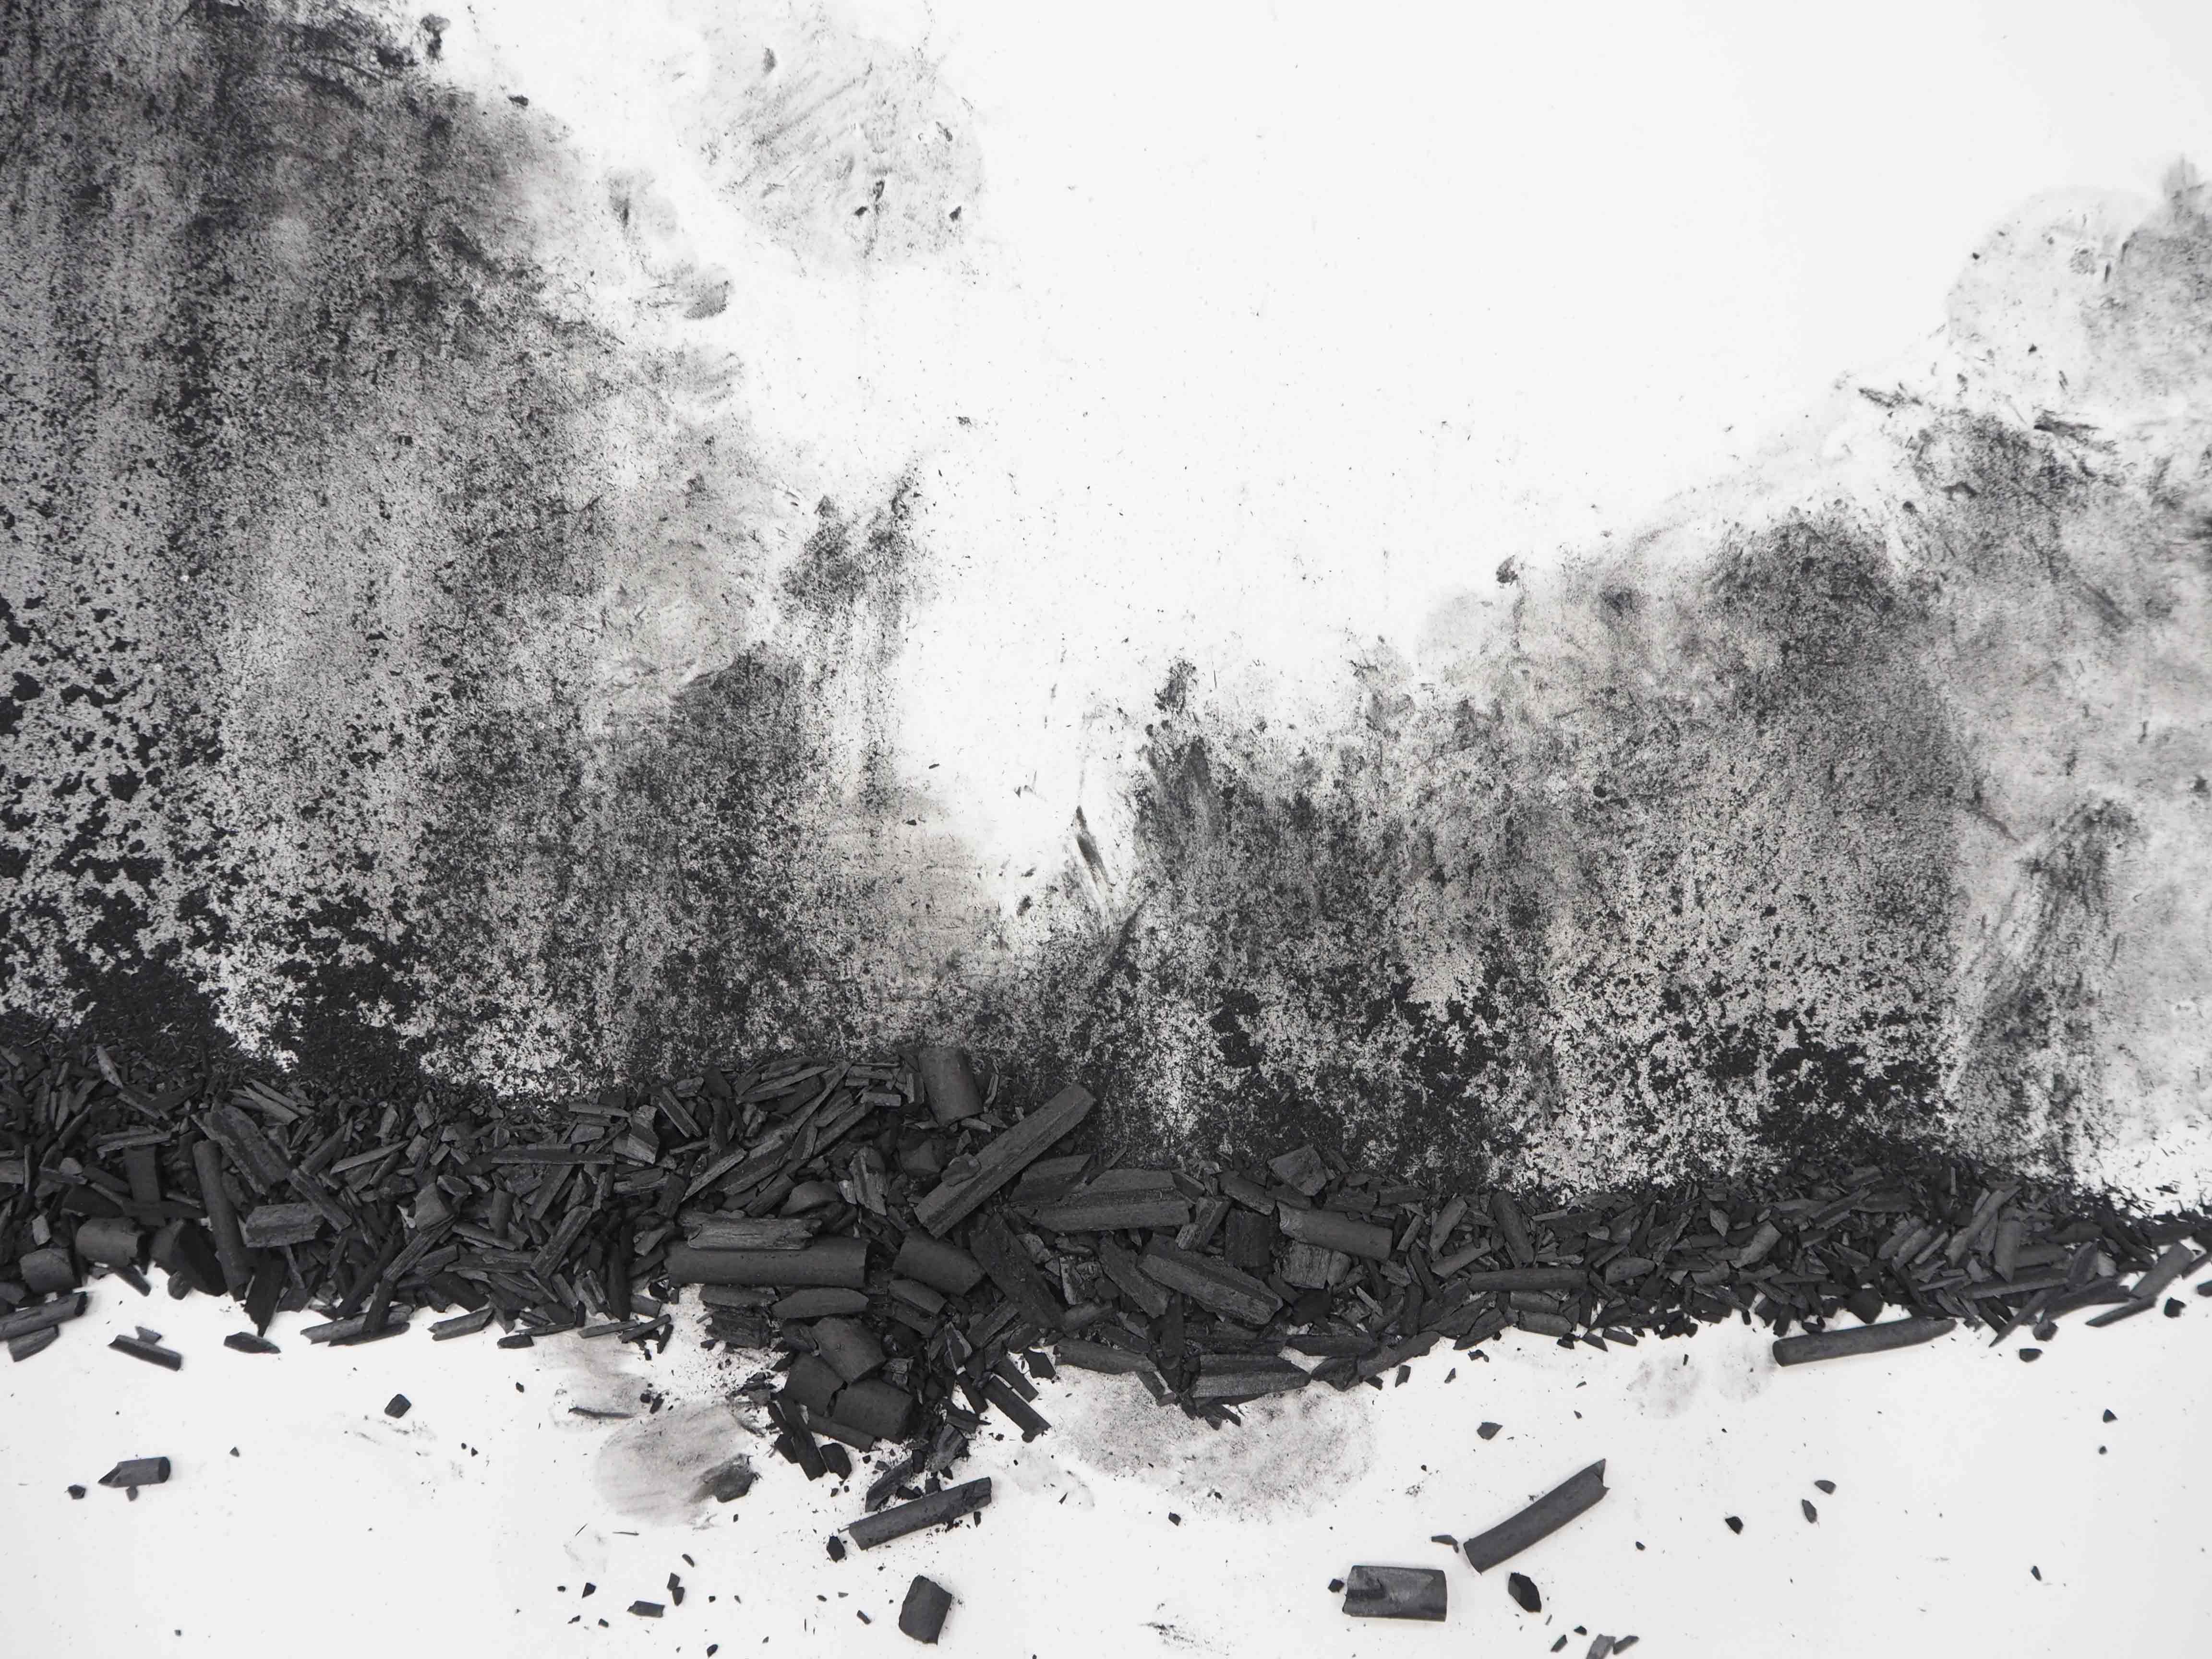 Crunch Time 14 (2020) - M. Lohrum